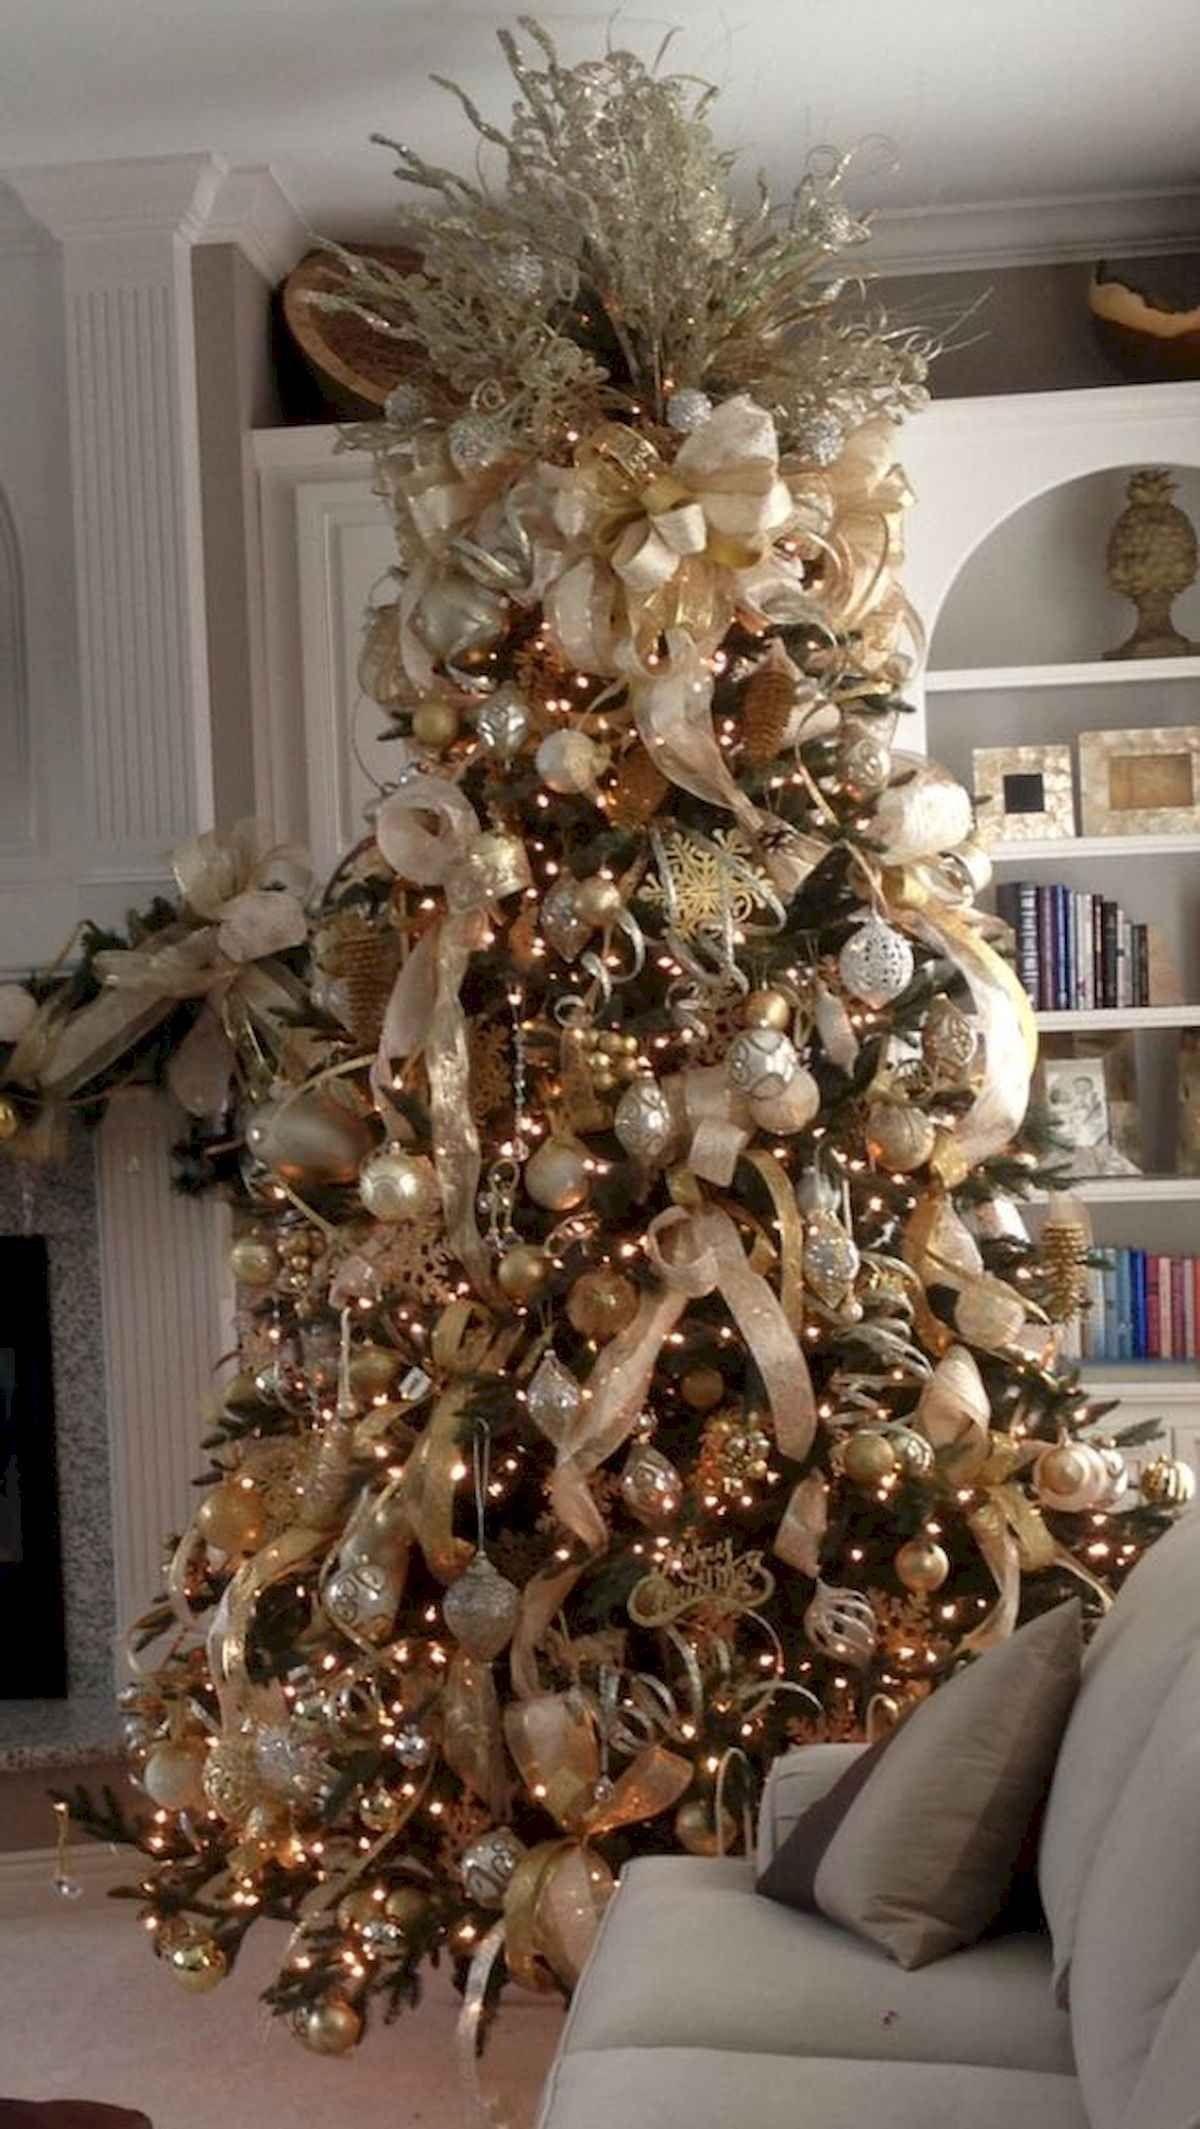 40 Elegant Christmas Tree Decor Ideas 15 in 2020 Elegant